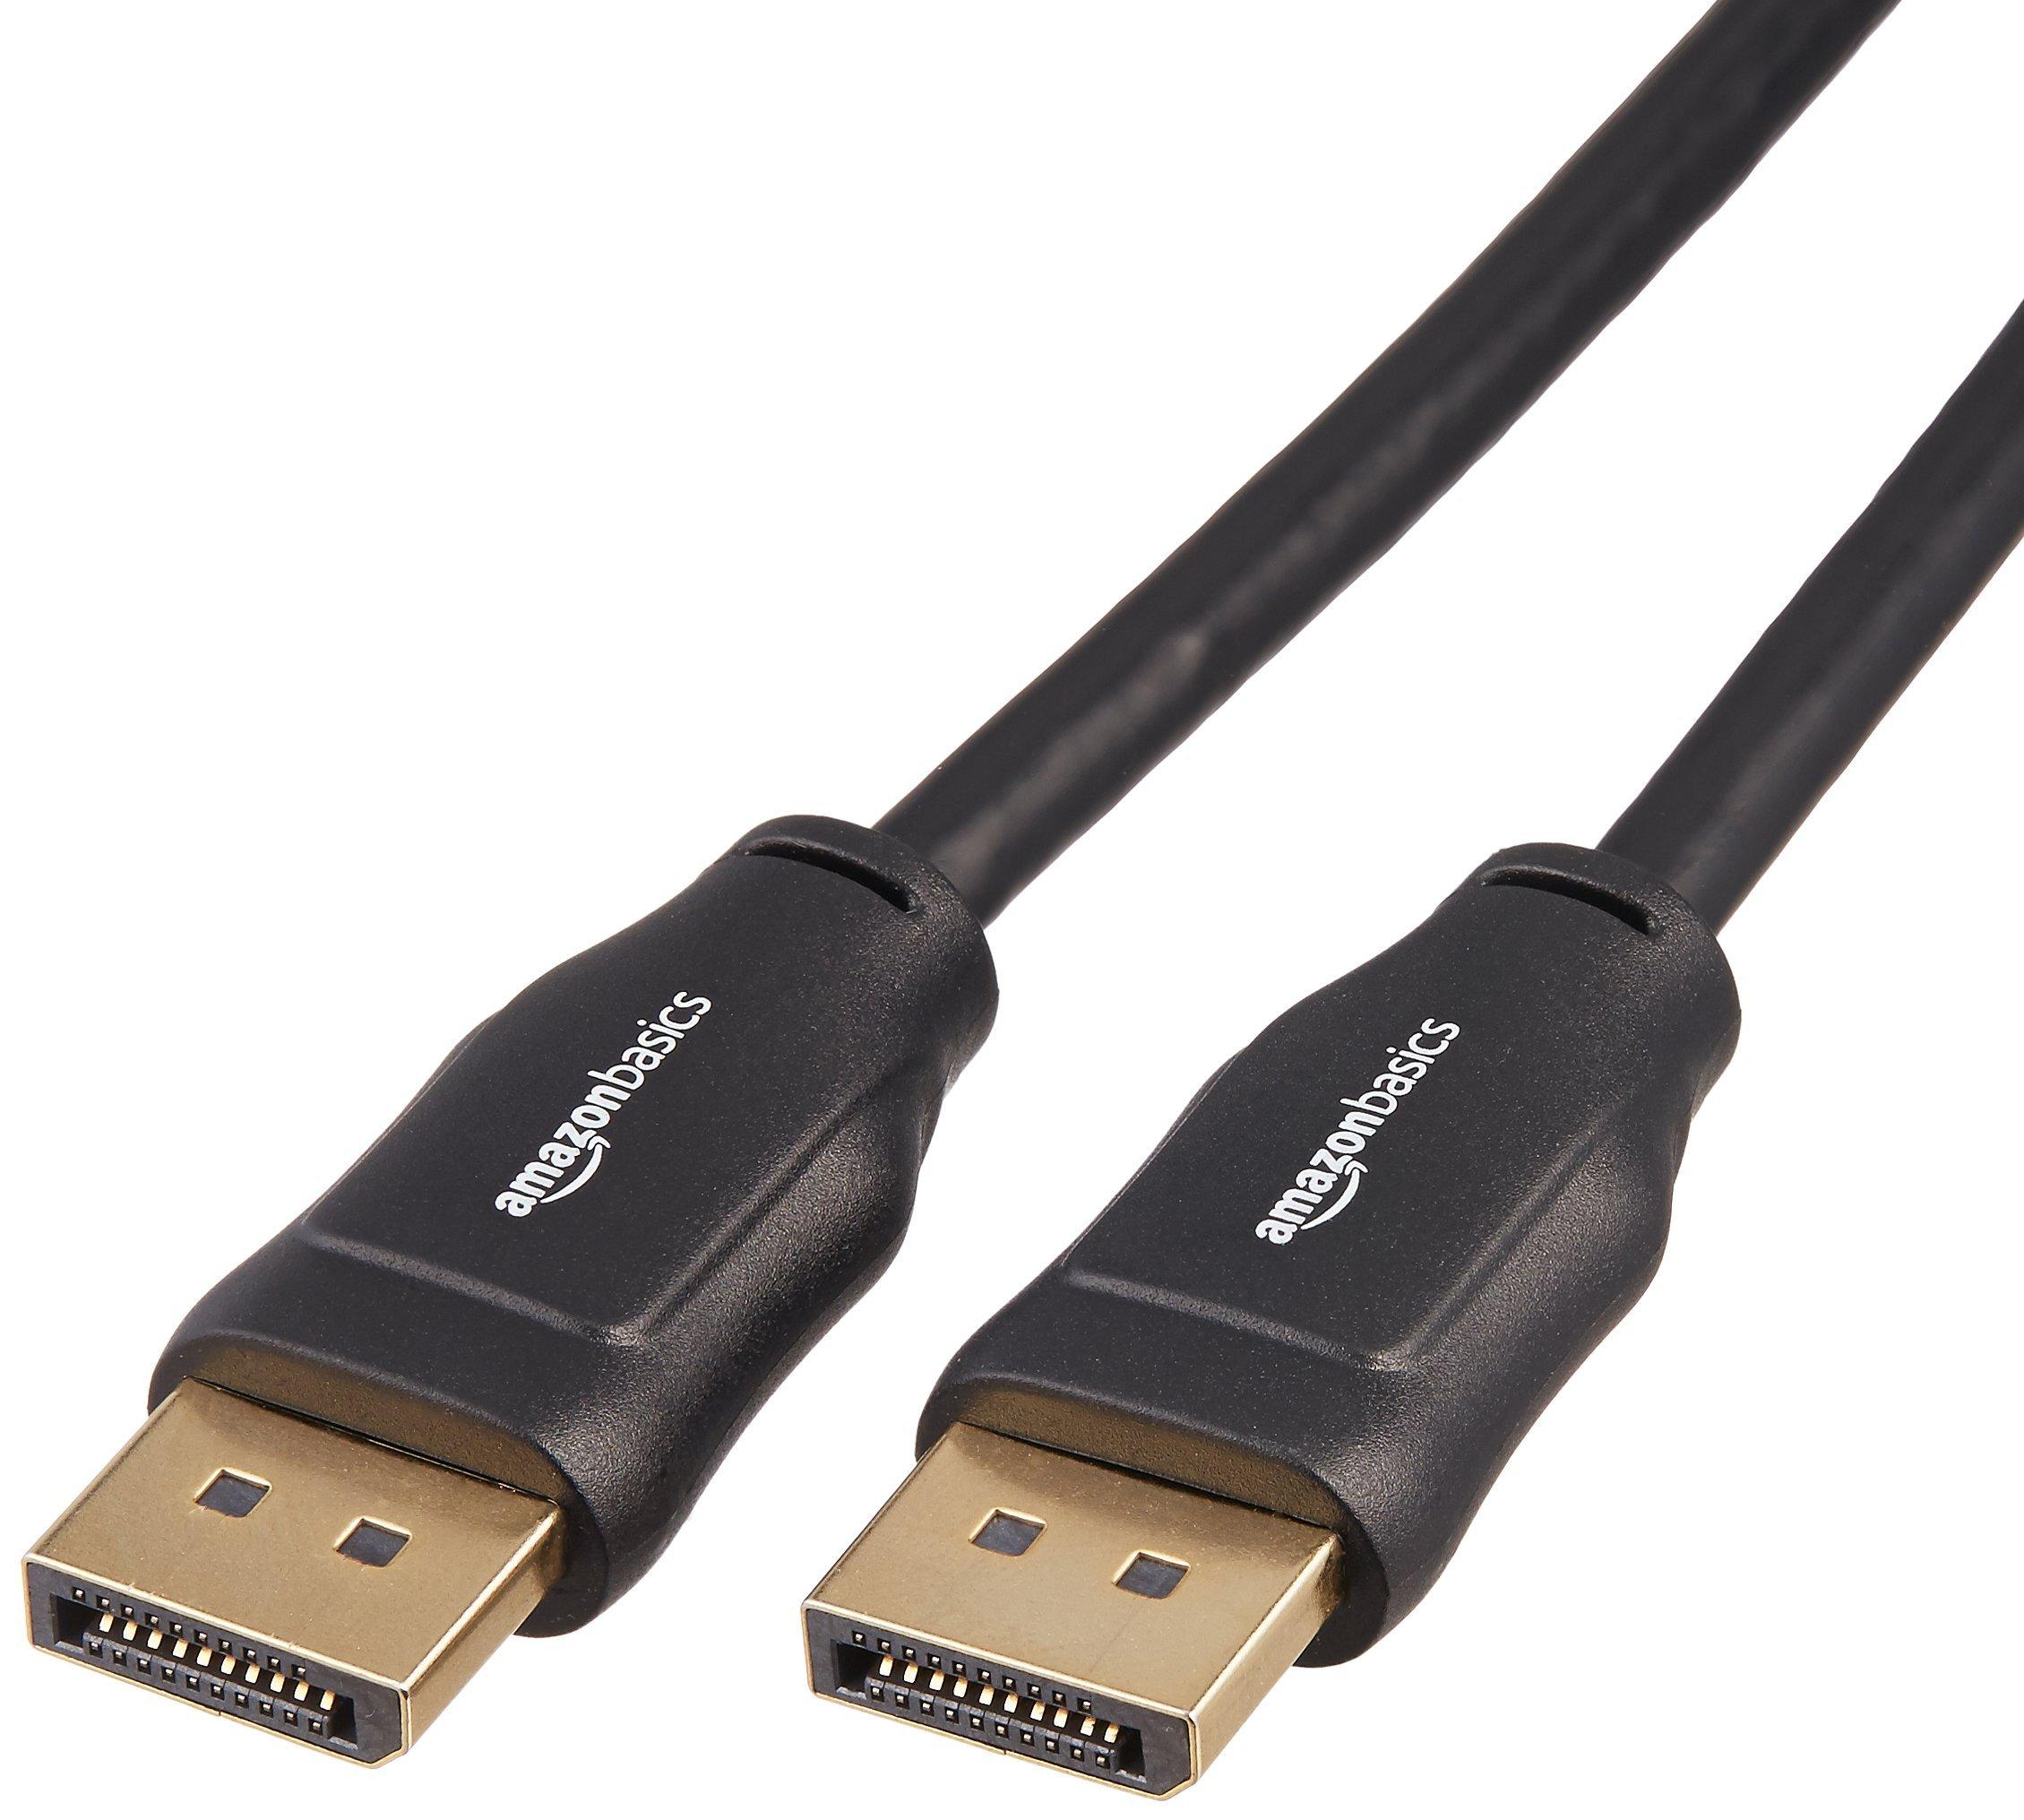 AmazonBasics DisplayPort to DisplayPort Cable - 25 Feet